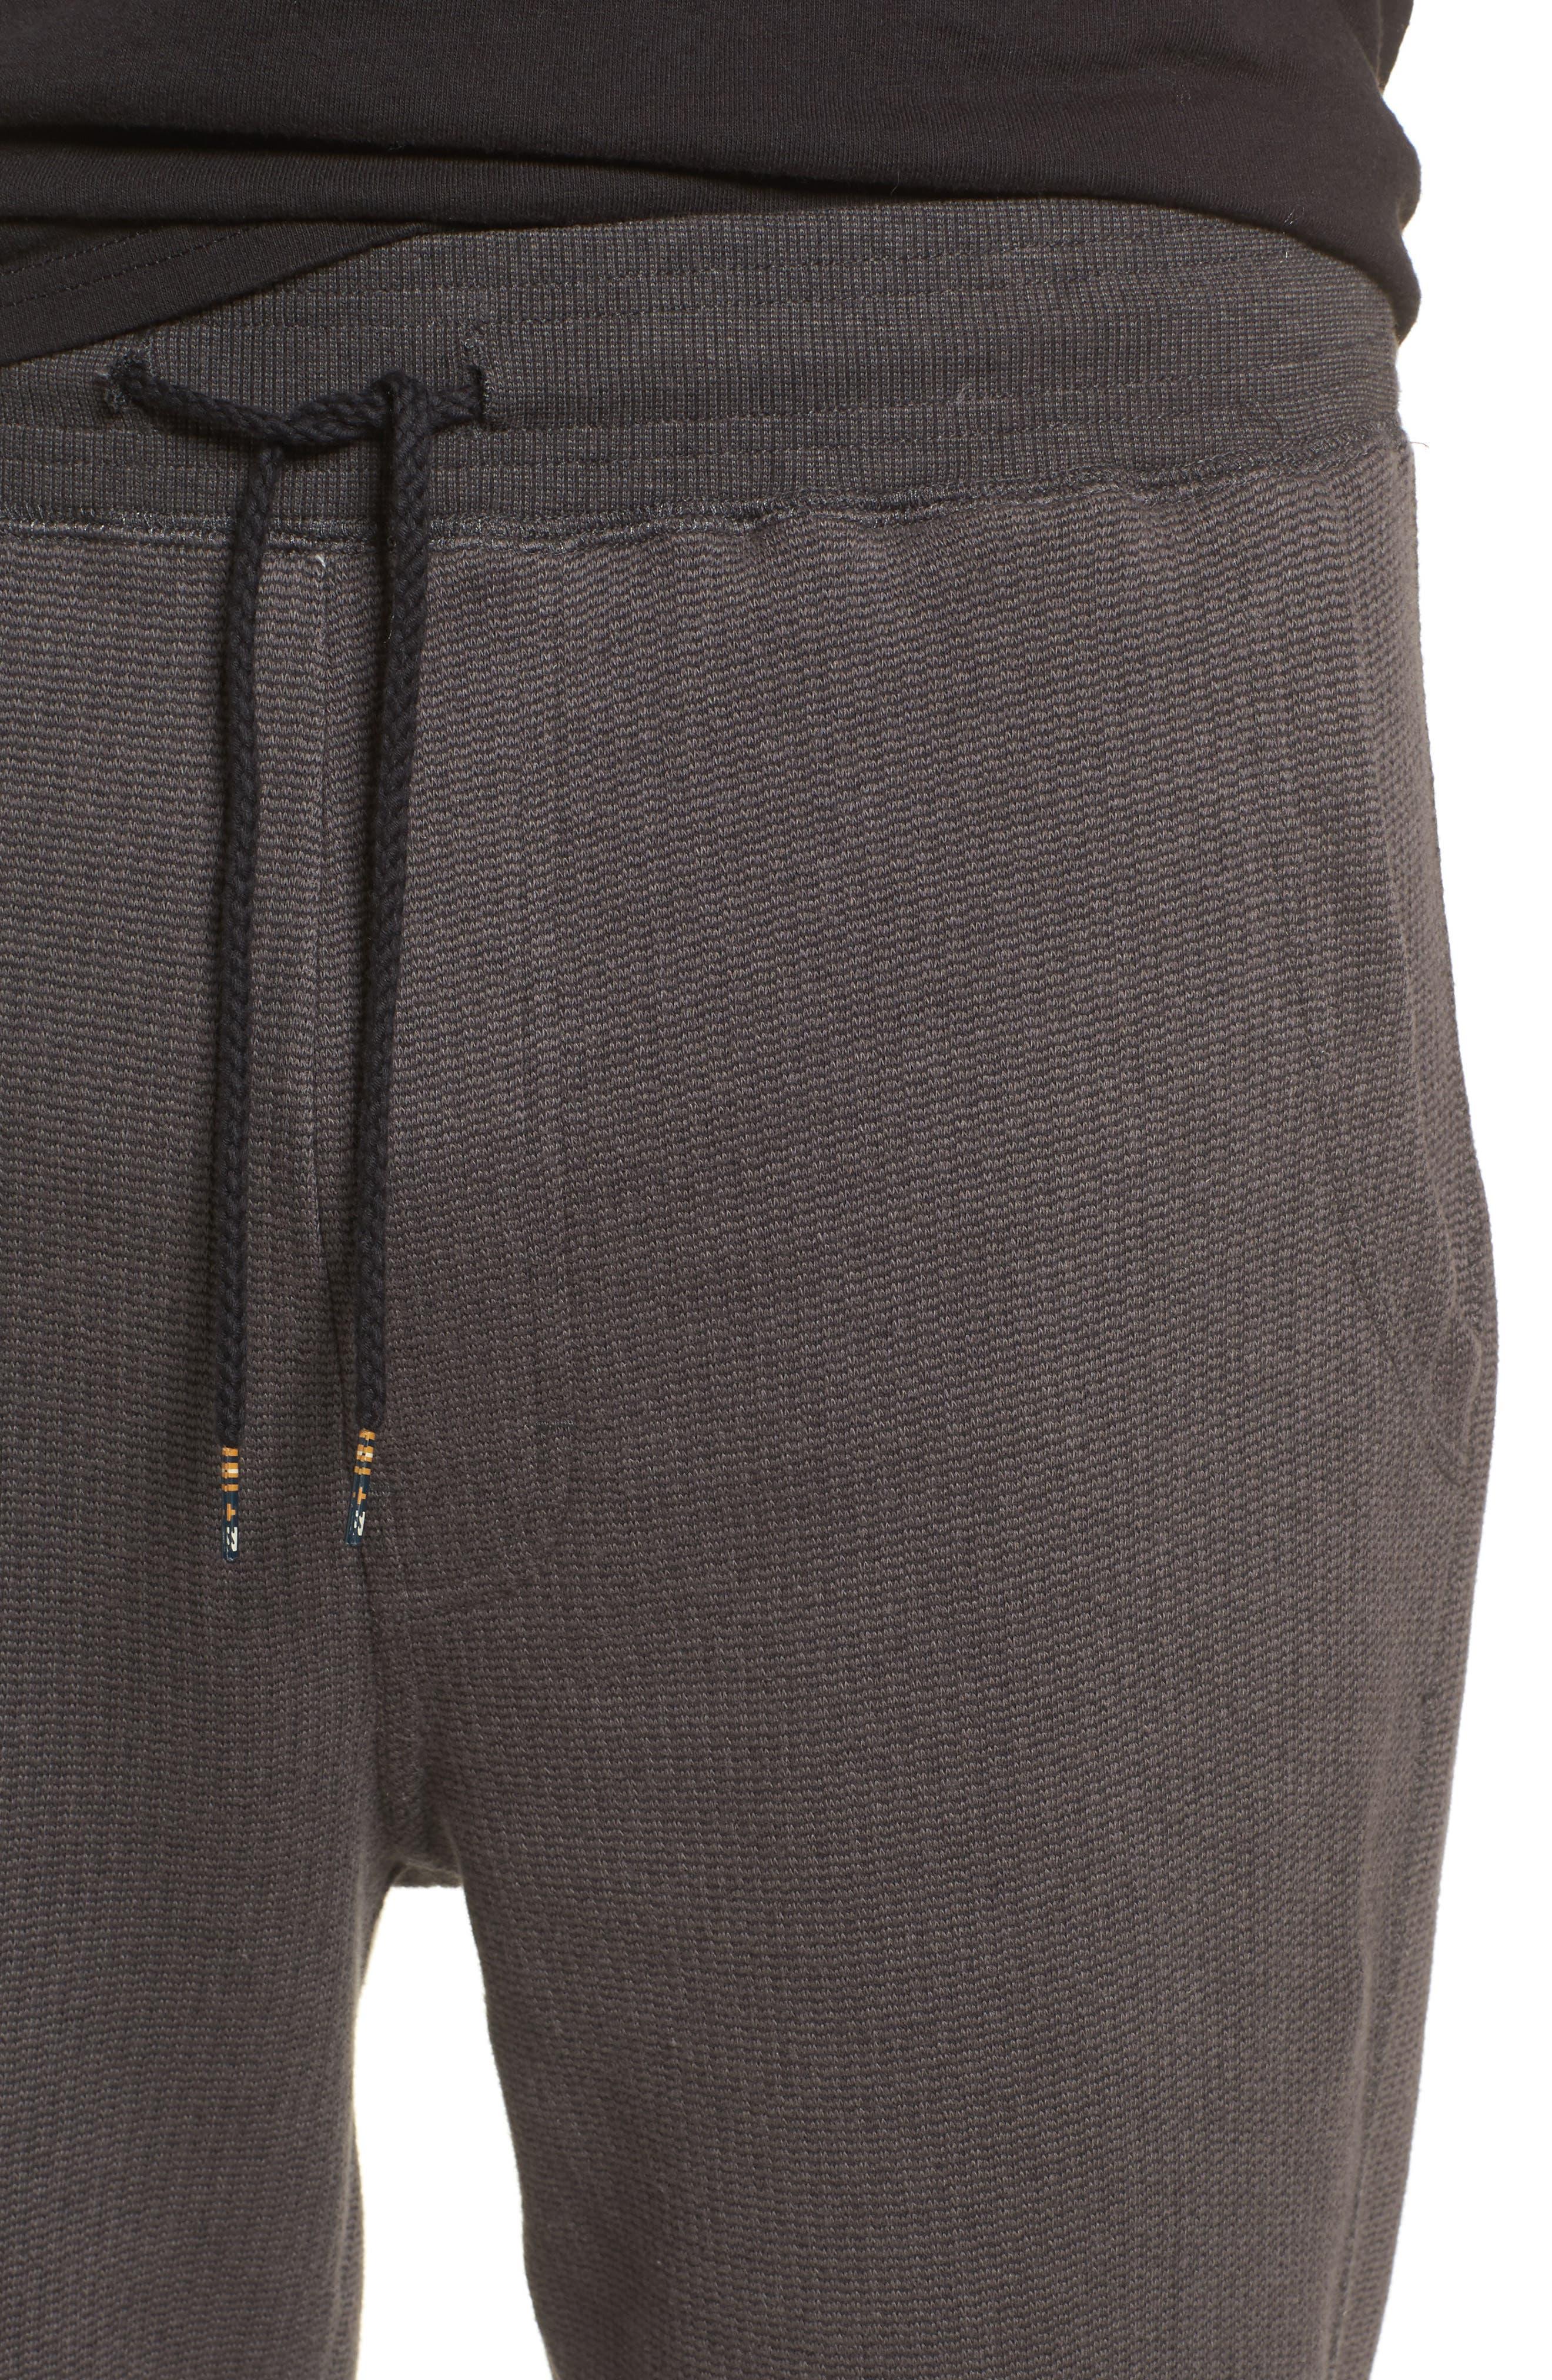 Hudson Sweatpants,                             Alternate thumbnail 4, color,                             001